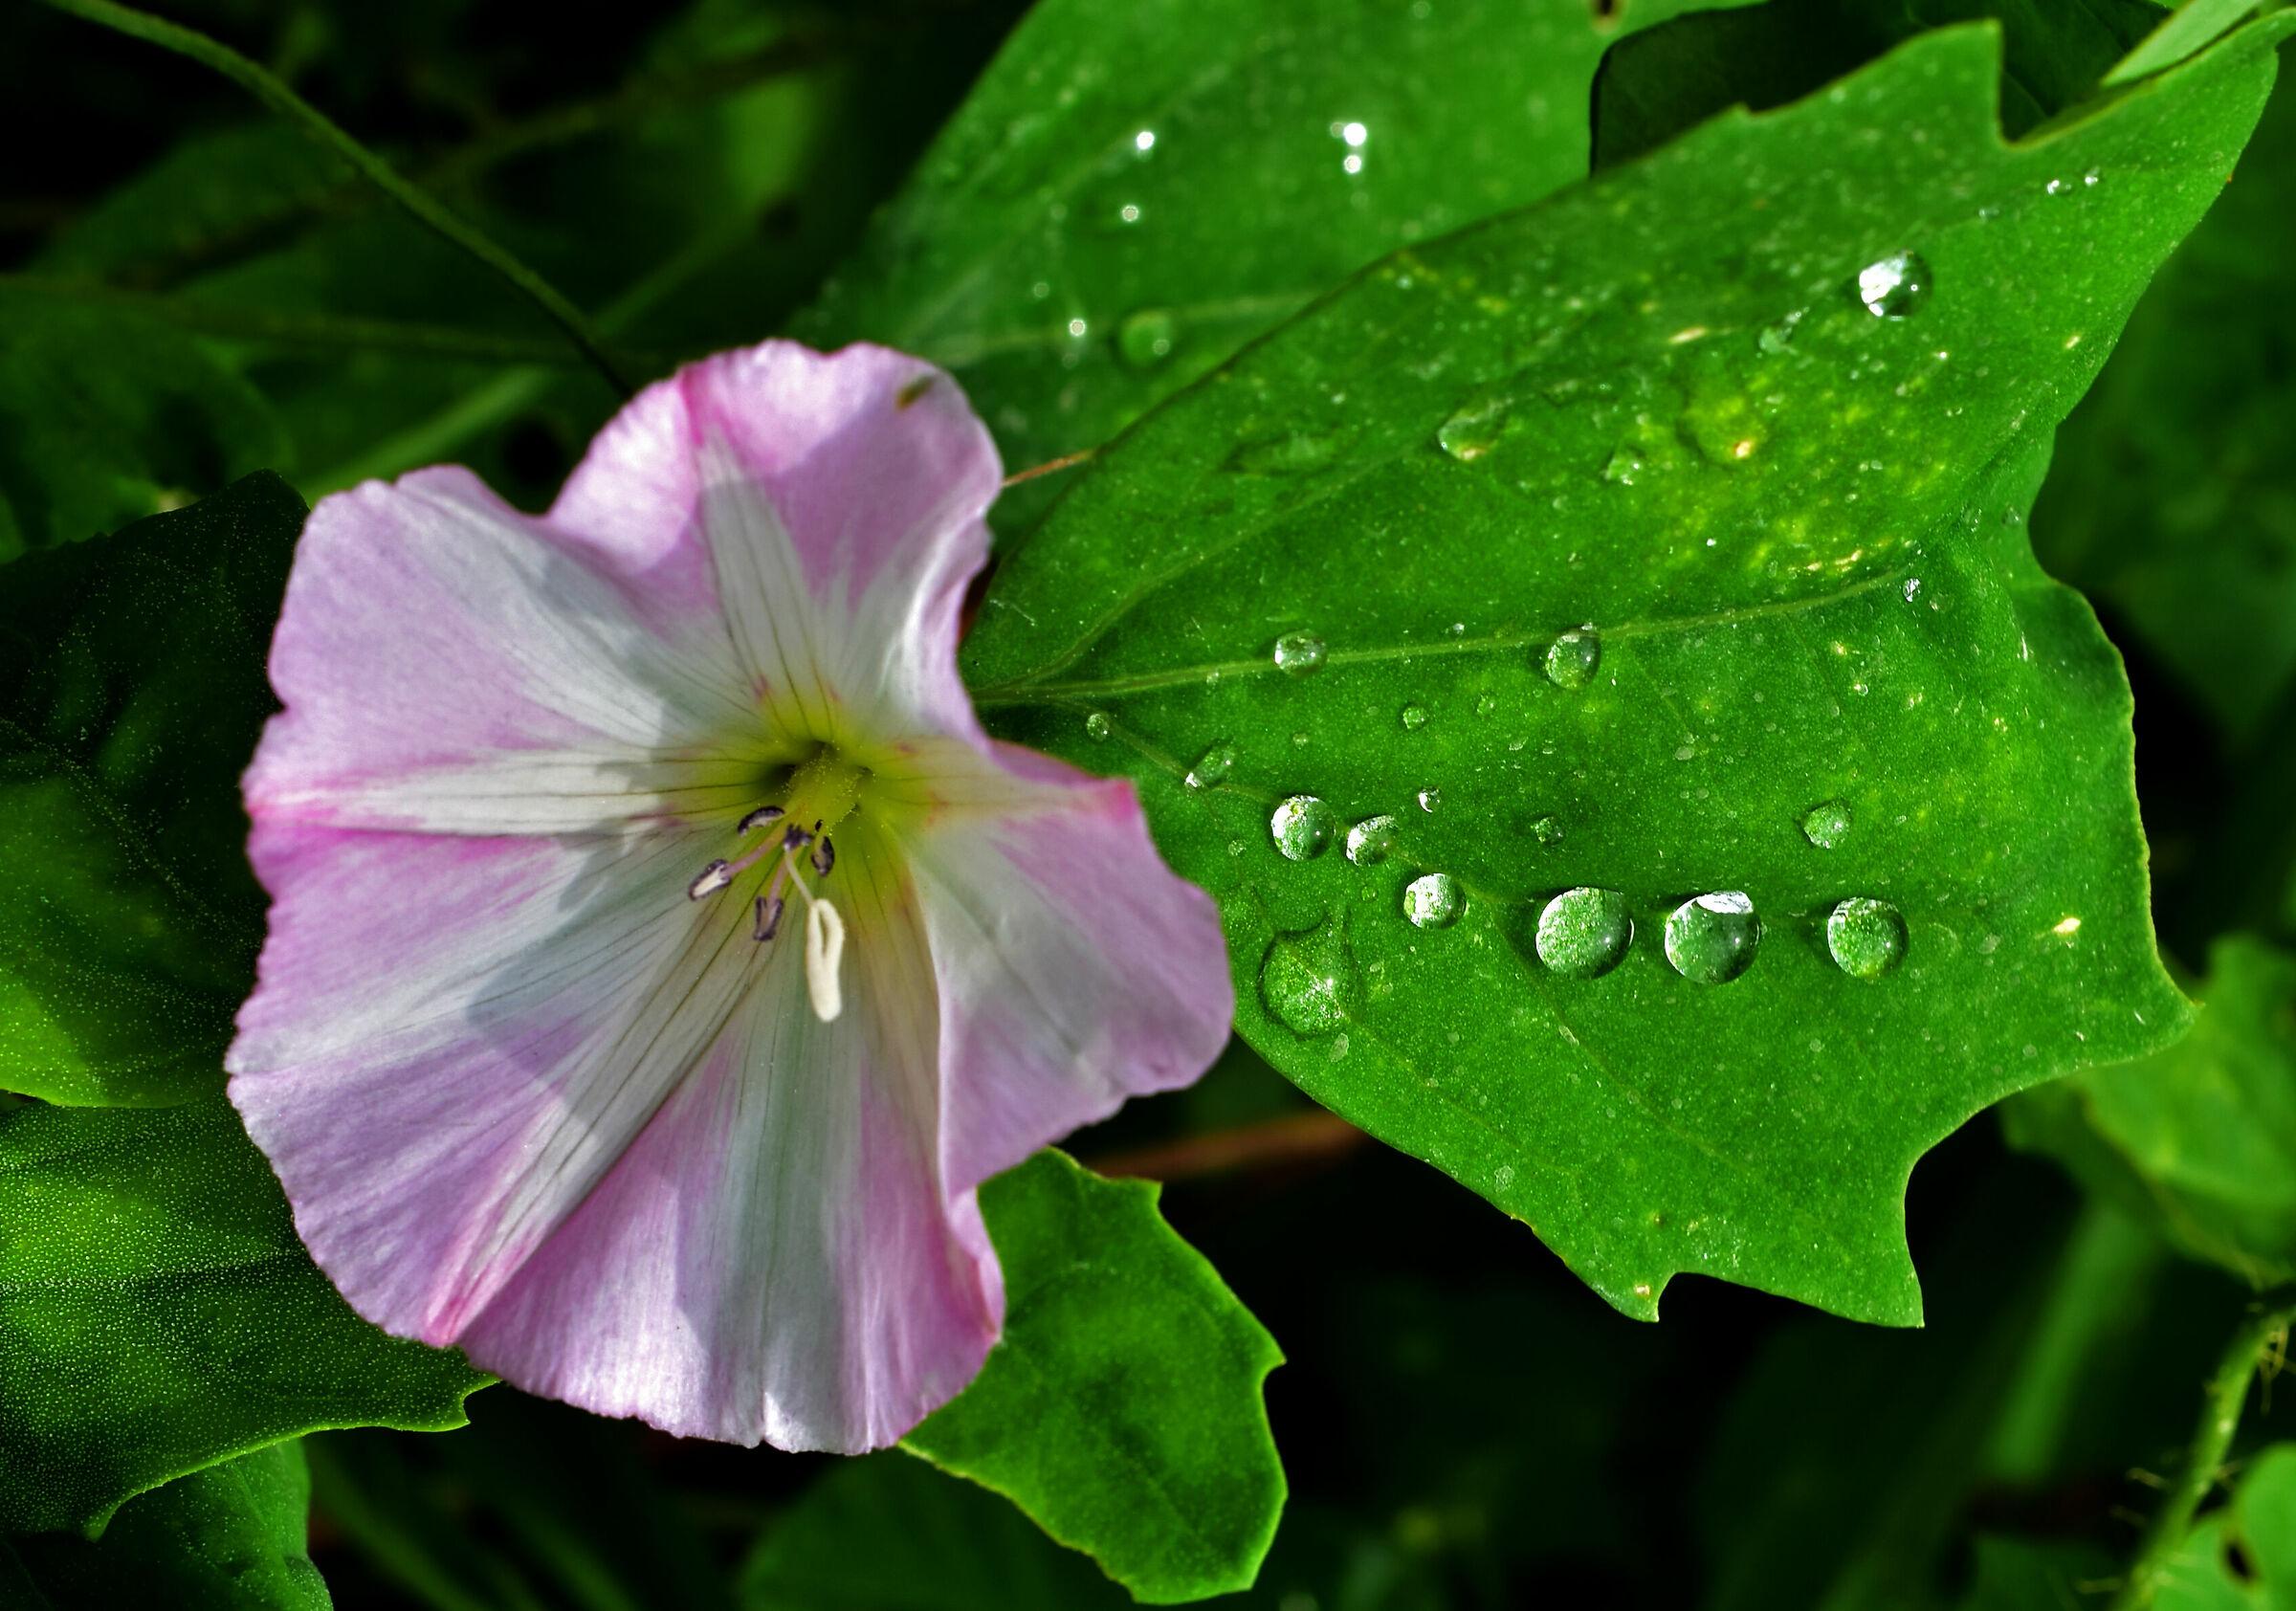 Drops over a green leaf...